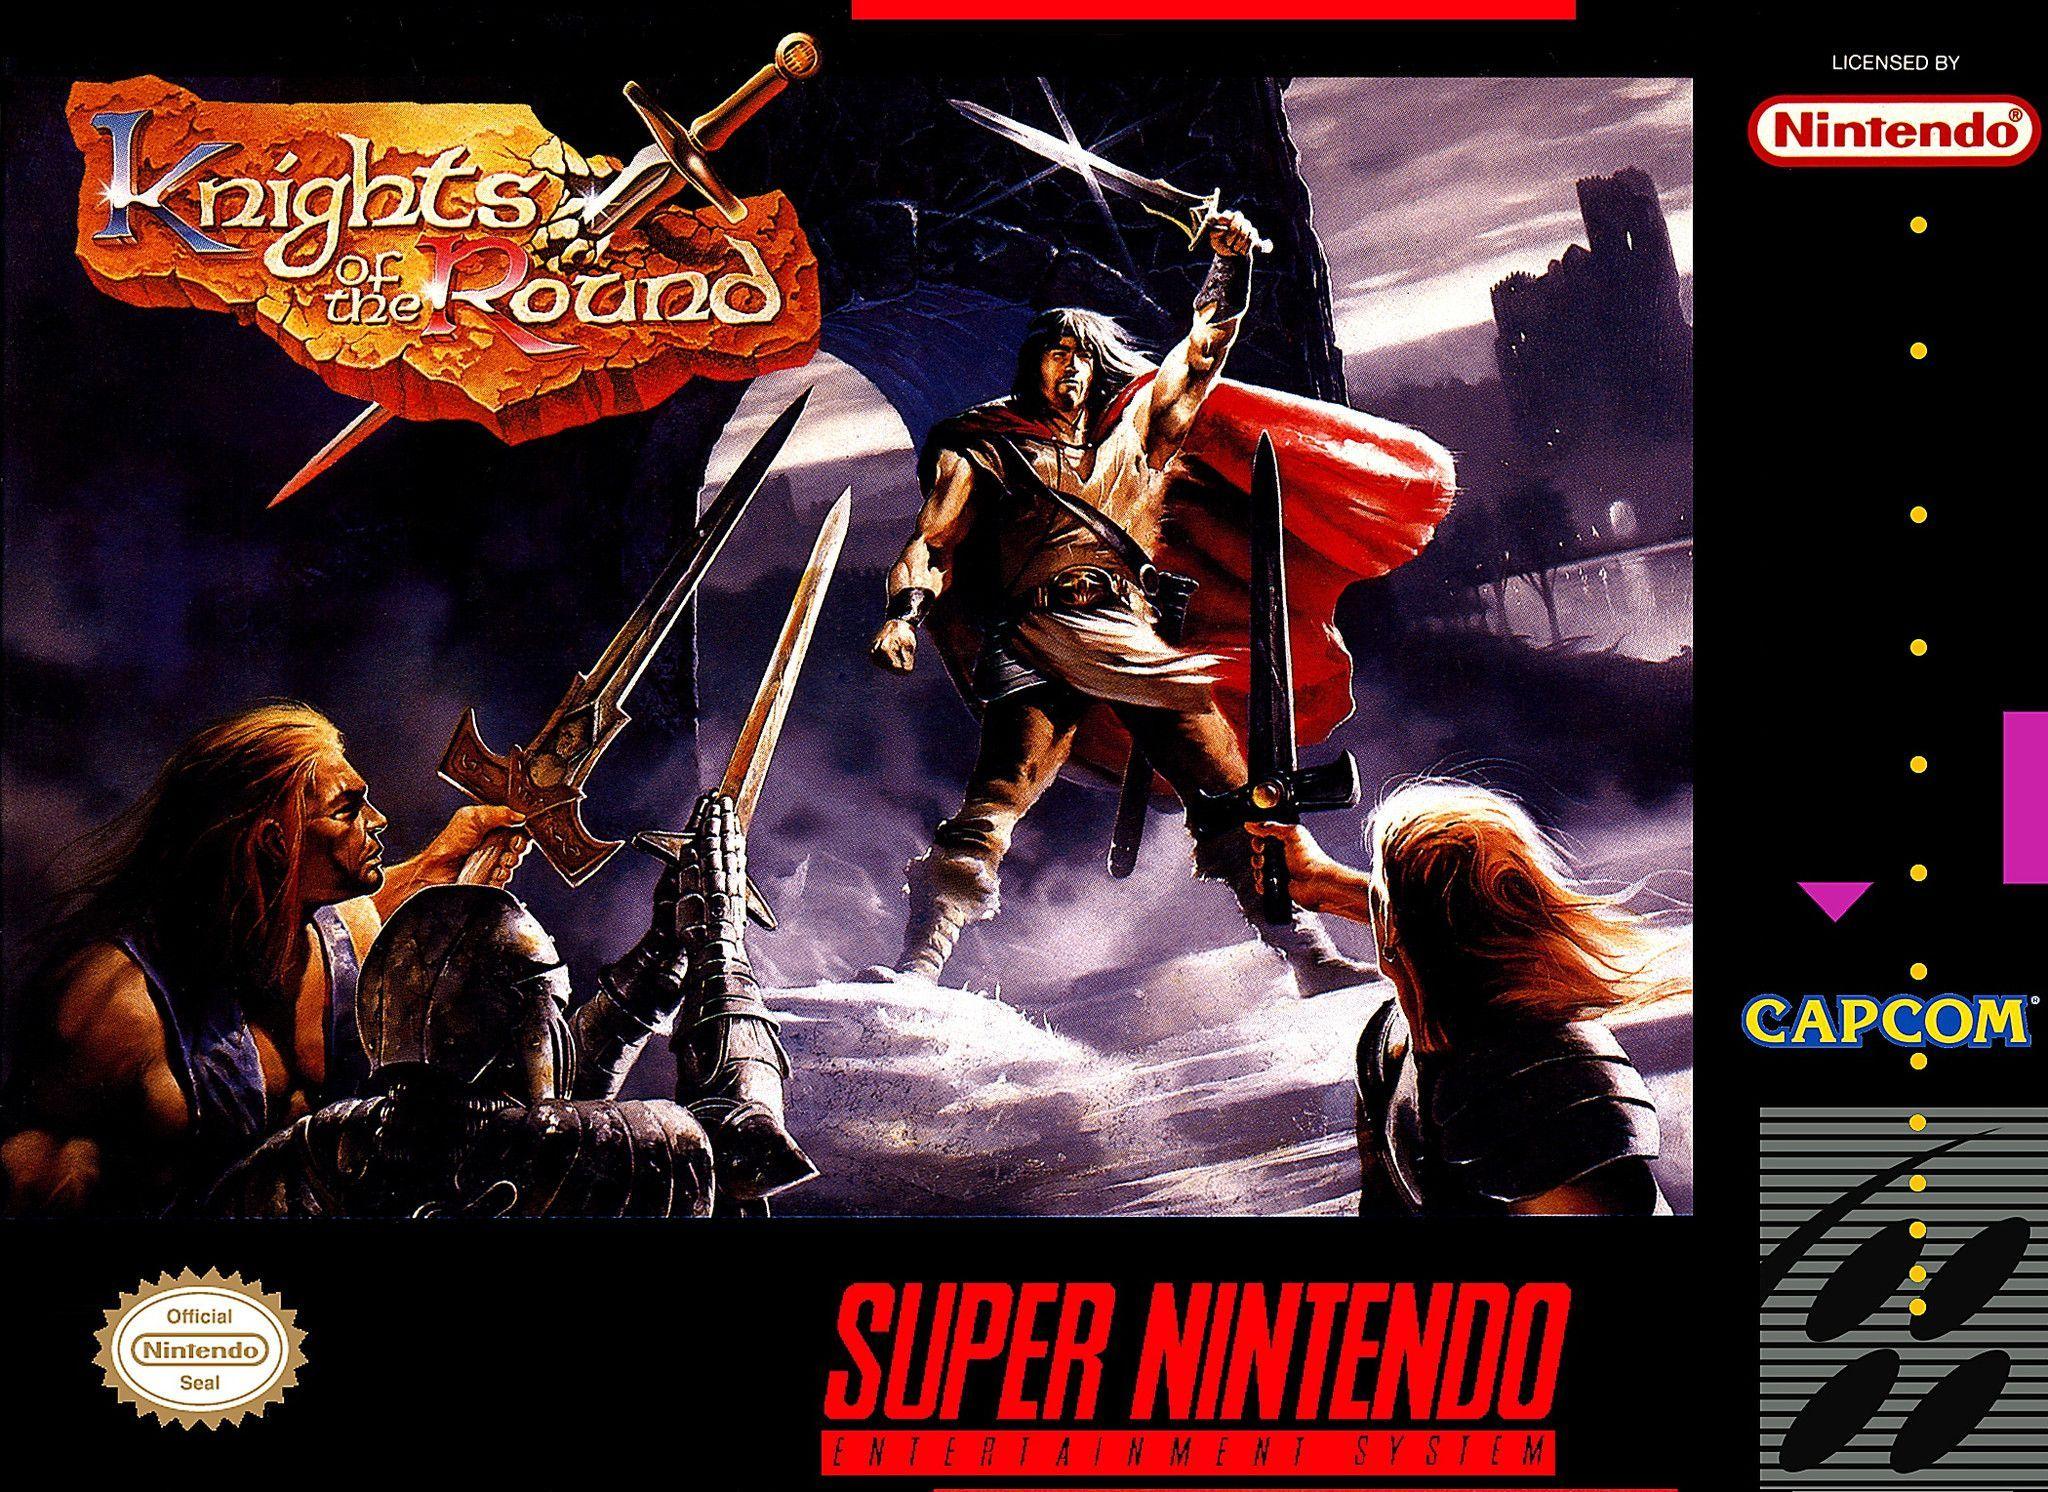 Knights Of The Round Snes Super Nintendo Repro Cart W Mini Box Manual Game Boy Nintendo Juegos Retro